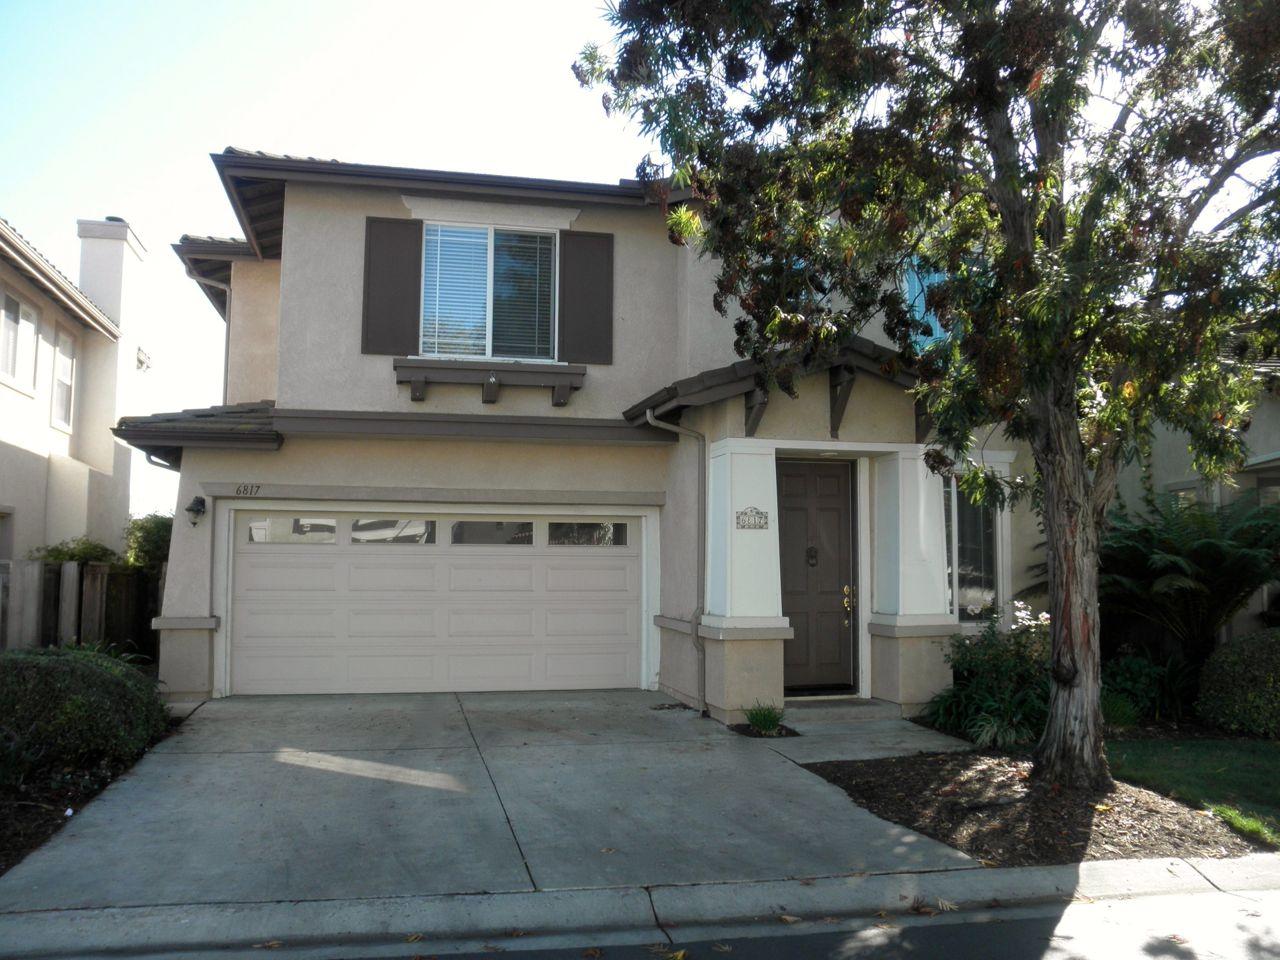 Property photo for 6817 Silkberry Ln Goleta, California 93117 - 12-3812